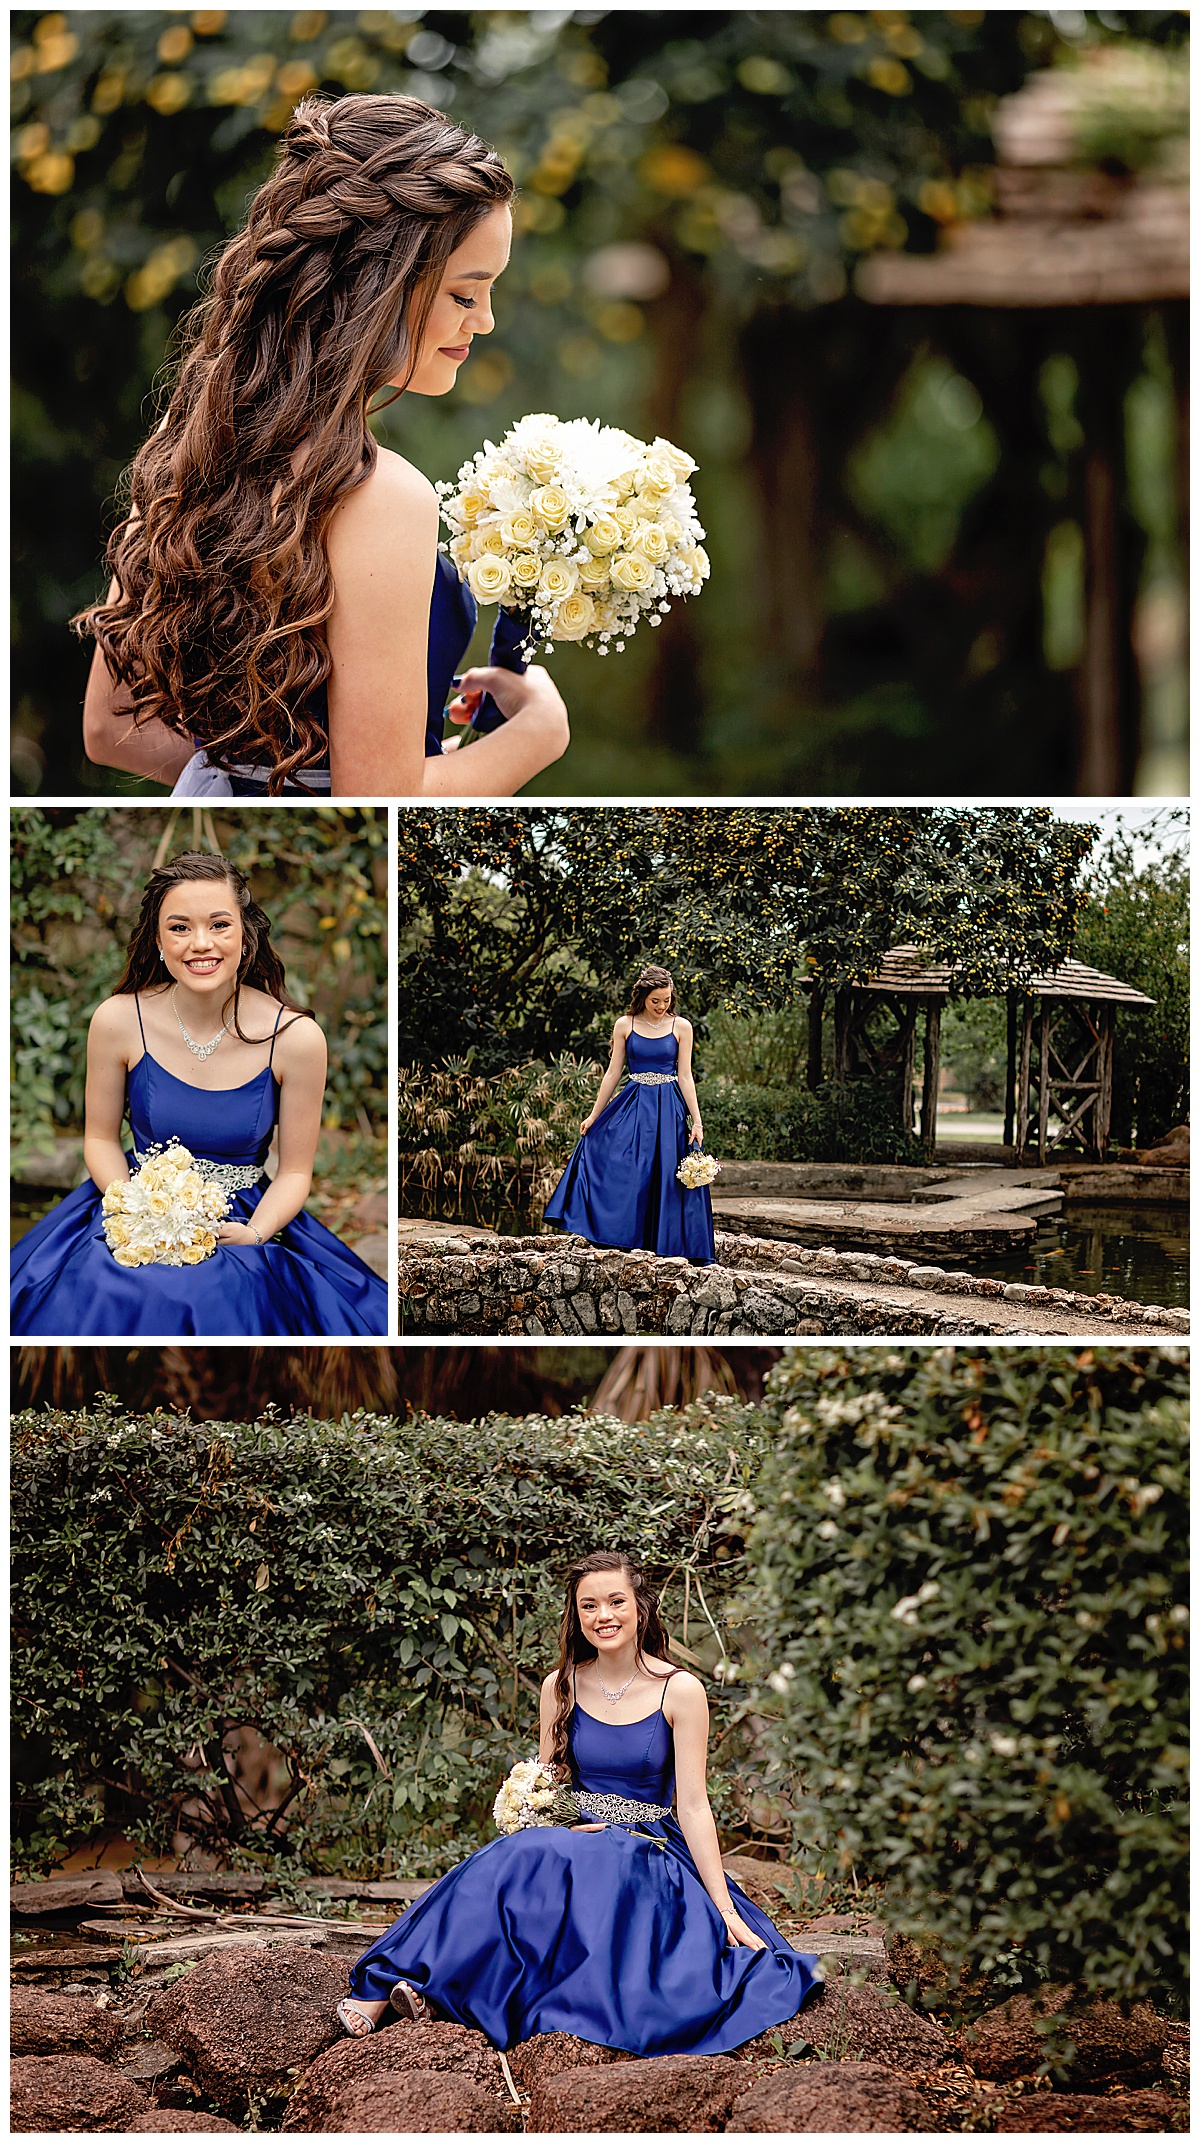 Family-Photographer-San-Antonio-Texas-McNay-Art-Museum-Sweet-16-Carly-Barton-Photography_0004.jpg